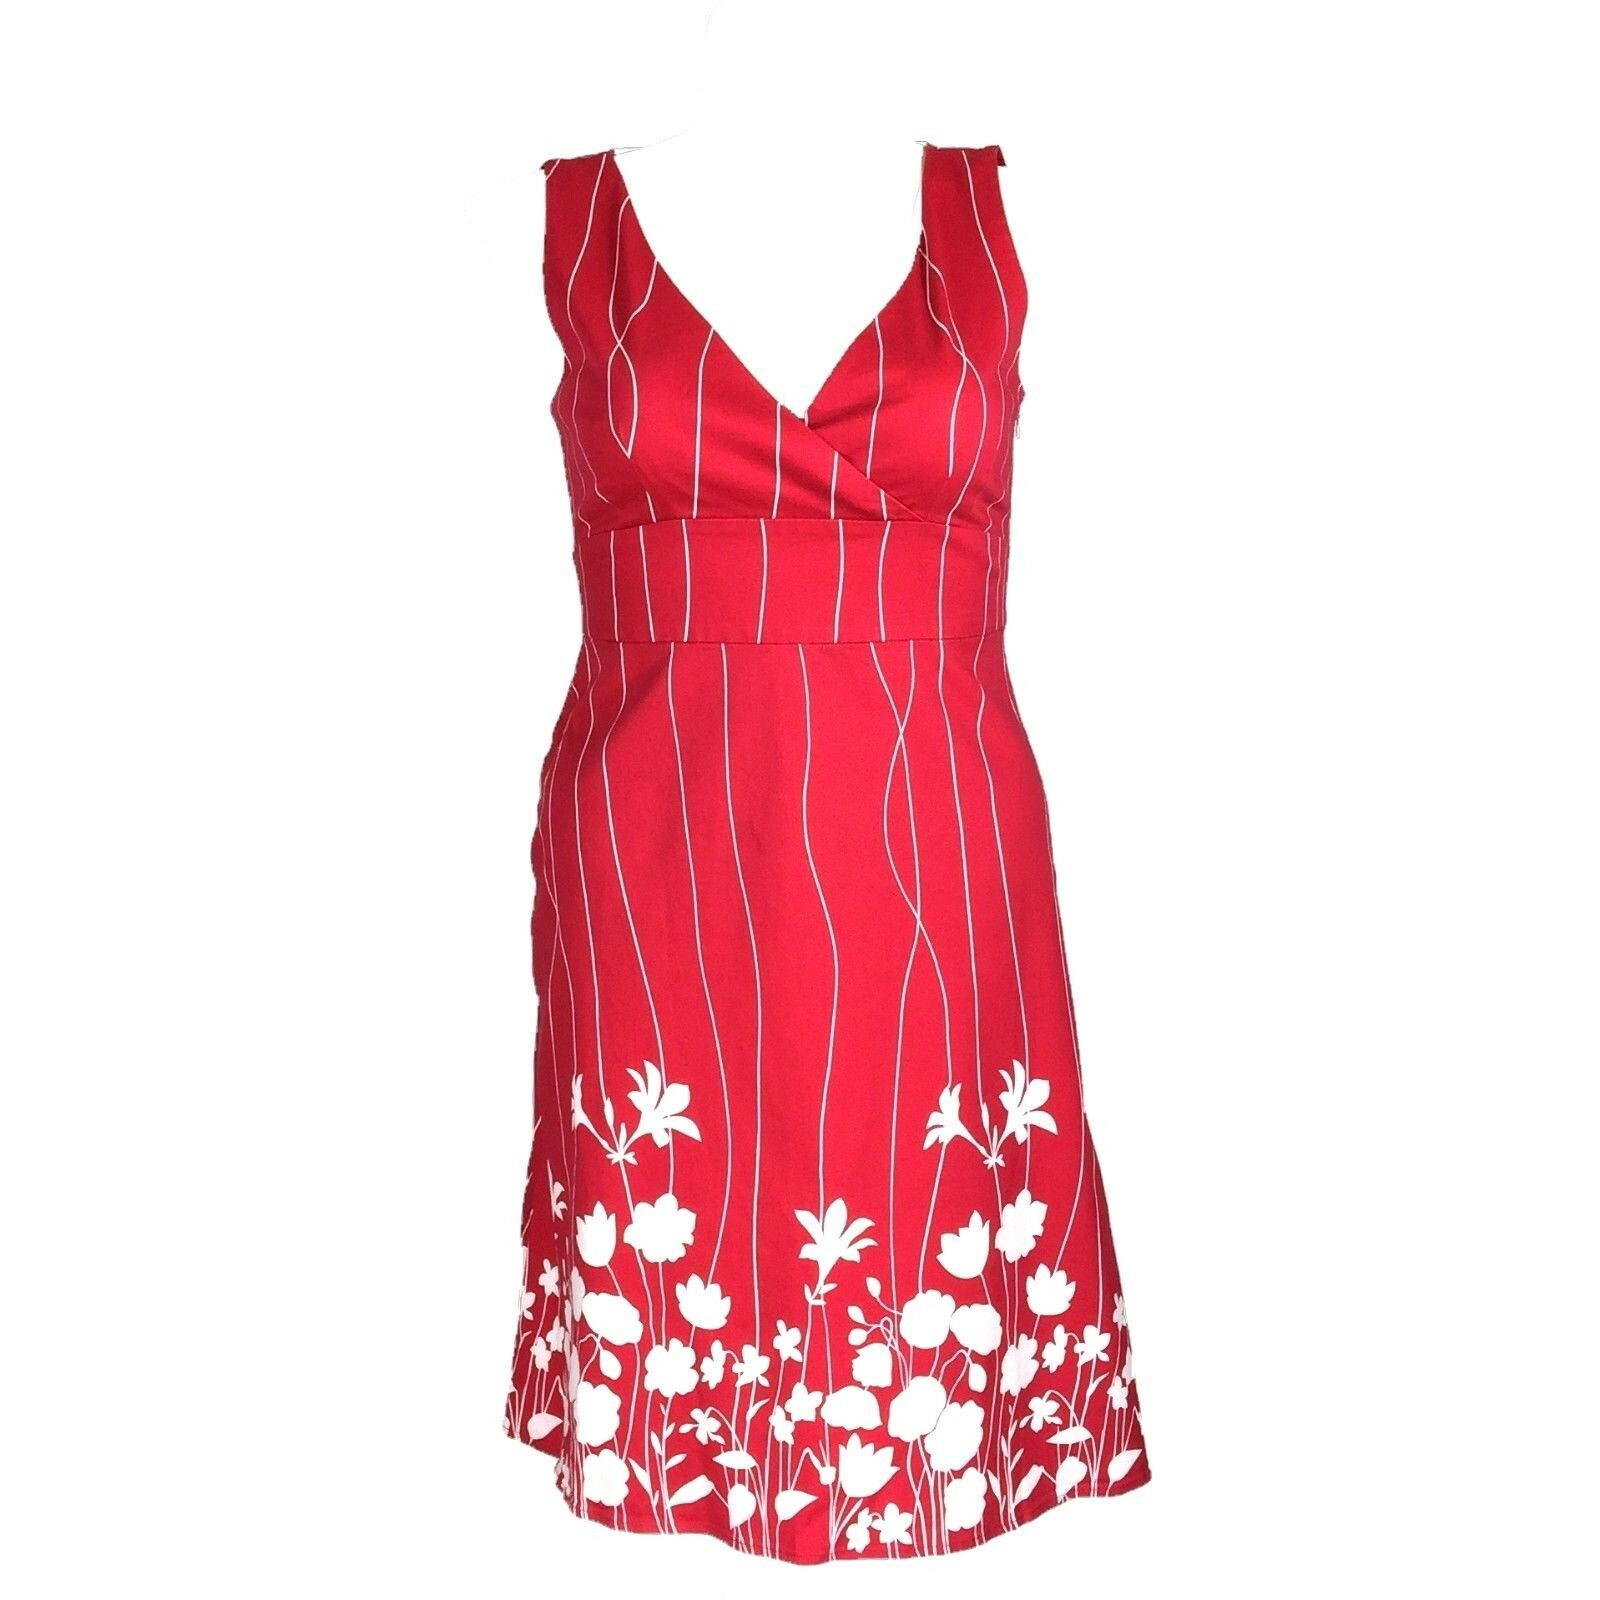 Spense Dress 12 Red White Stripe Silhouette Flower Empire A Line Rockabilly L